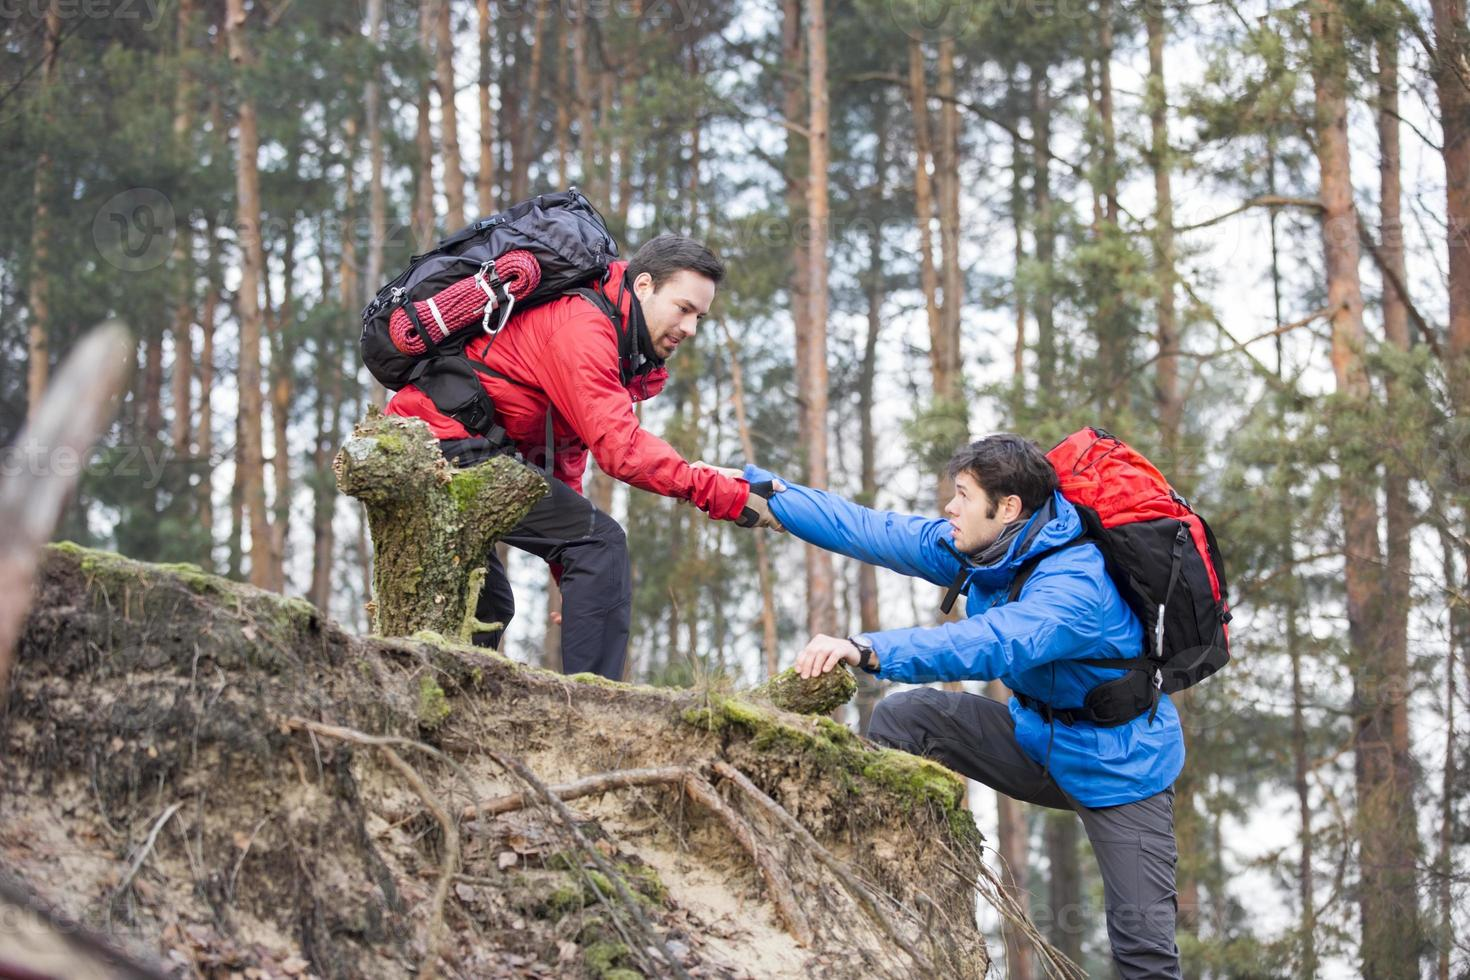 Wandern im Wald foto